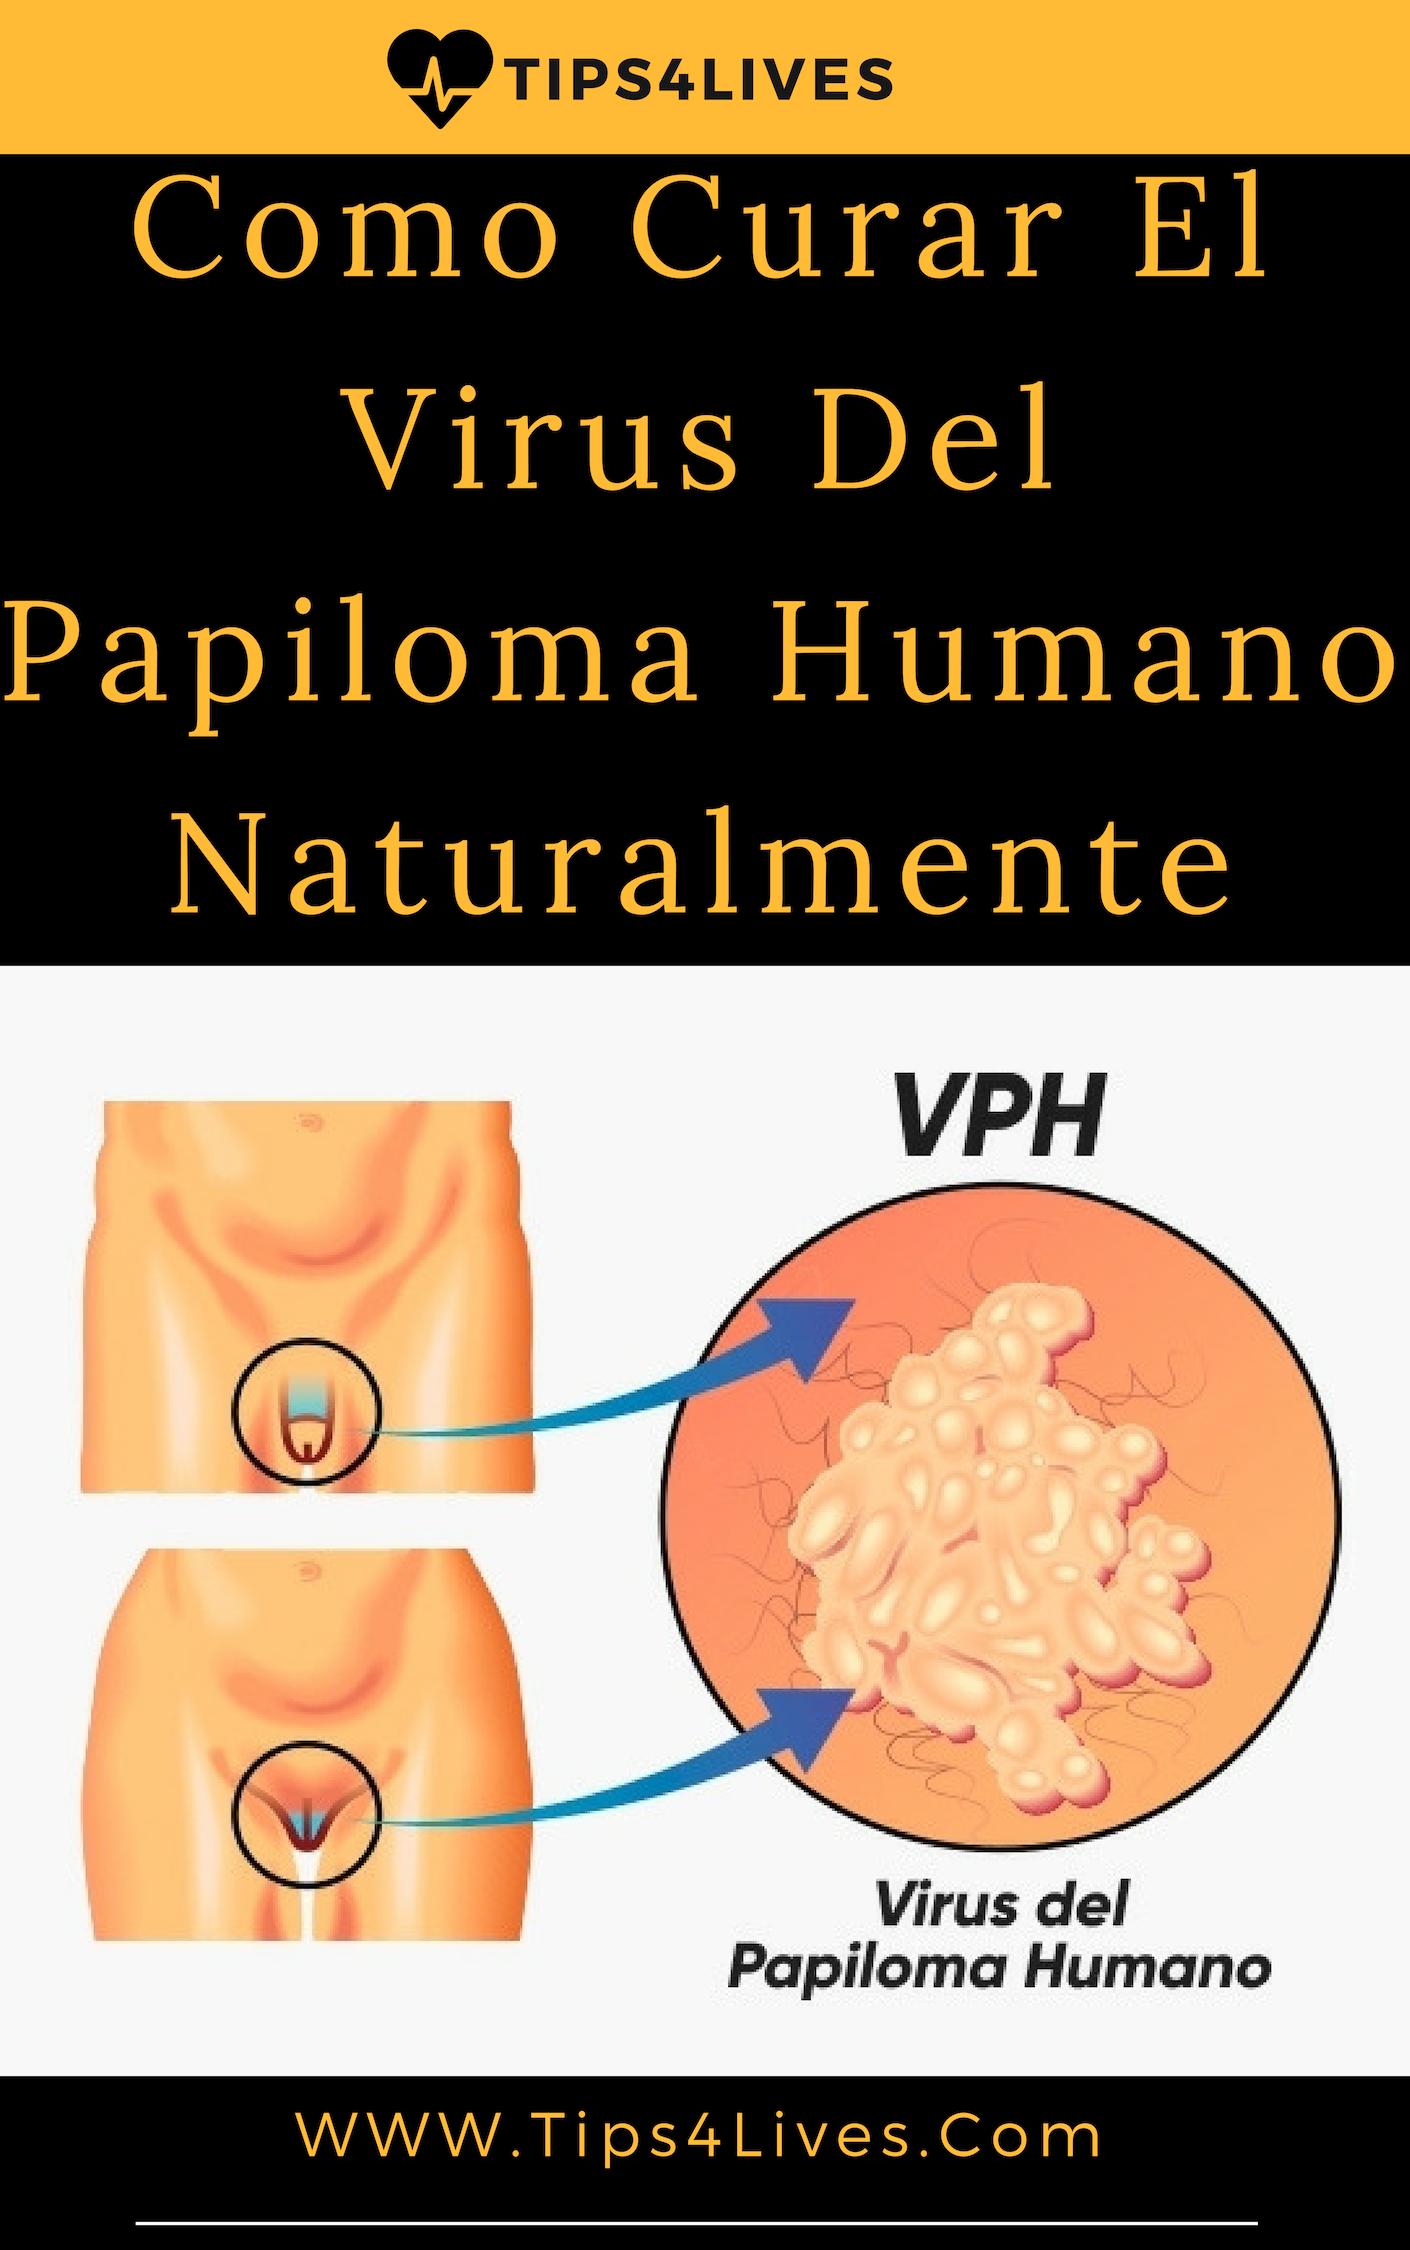 papiloma hpv cura cancer uretral tratamiento